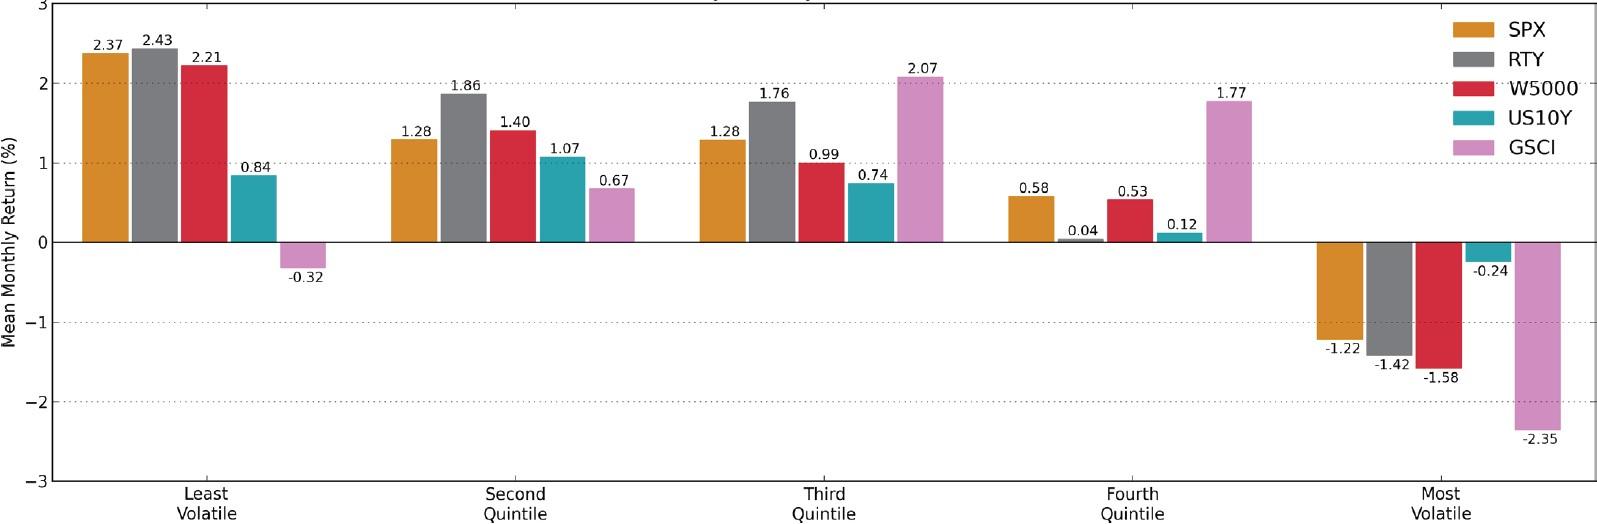 Exhibit 4: Return by volatility quintile, 1990-2014 (%)